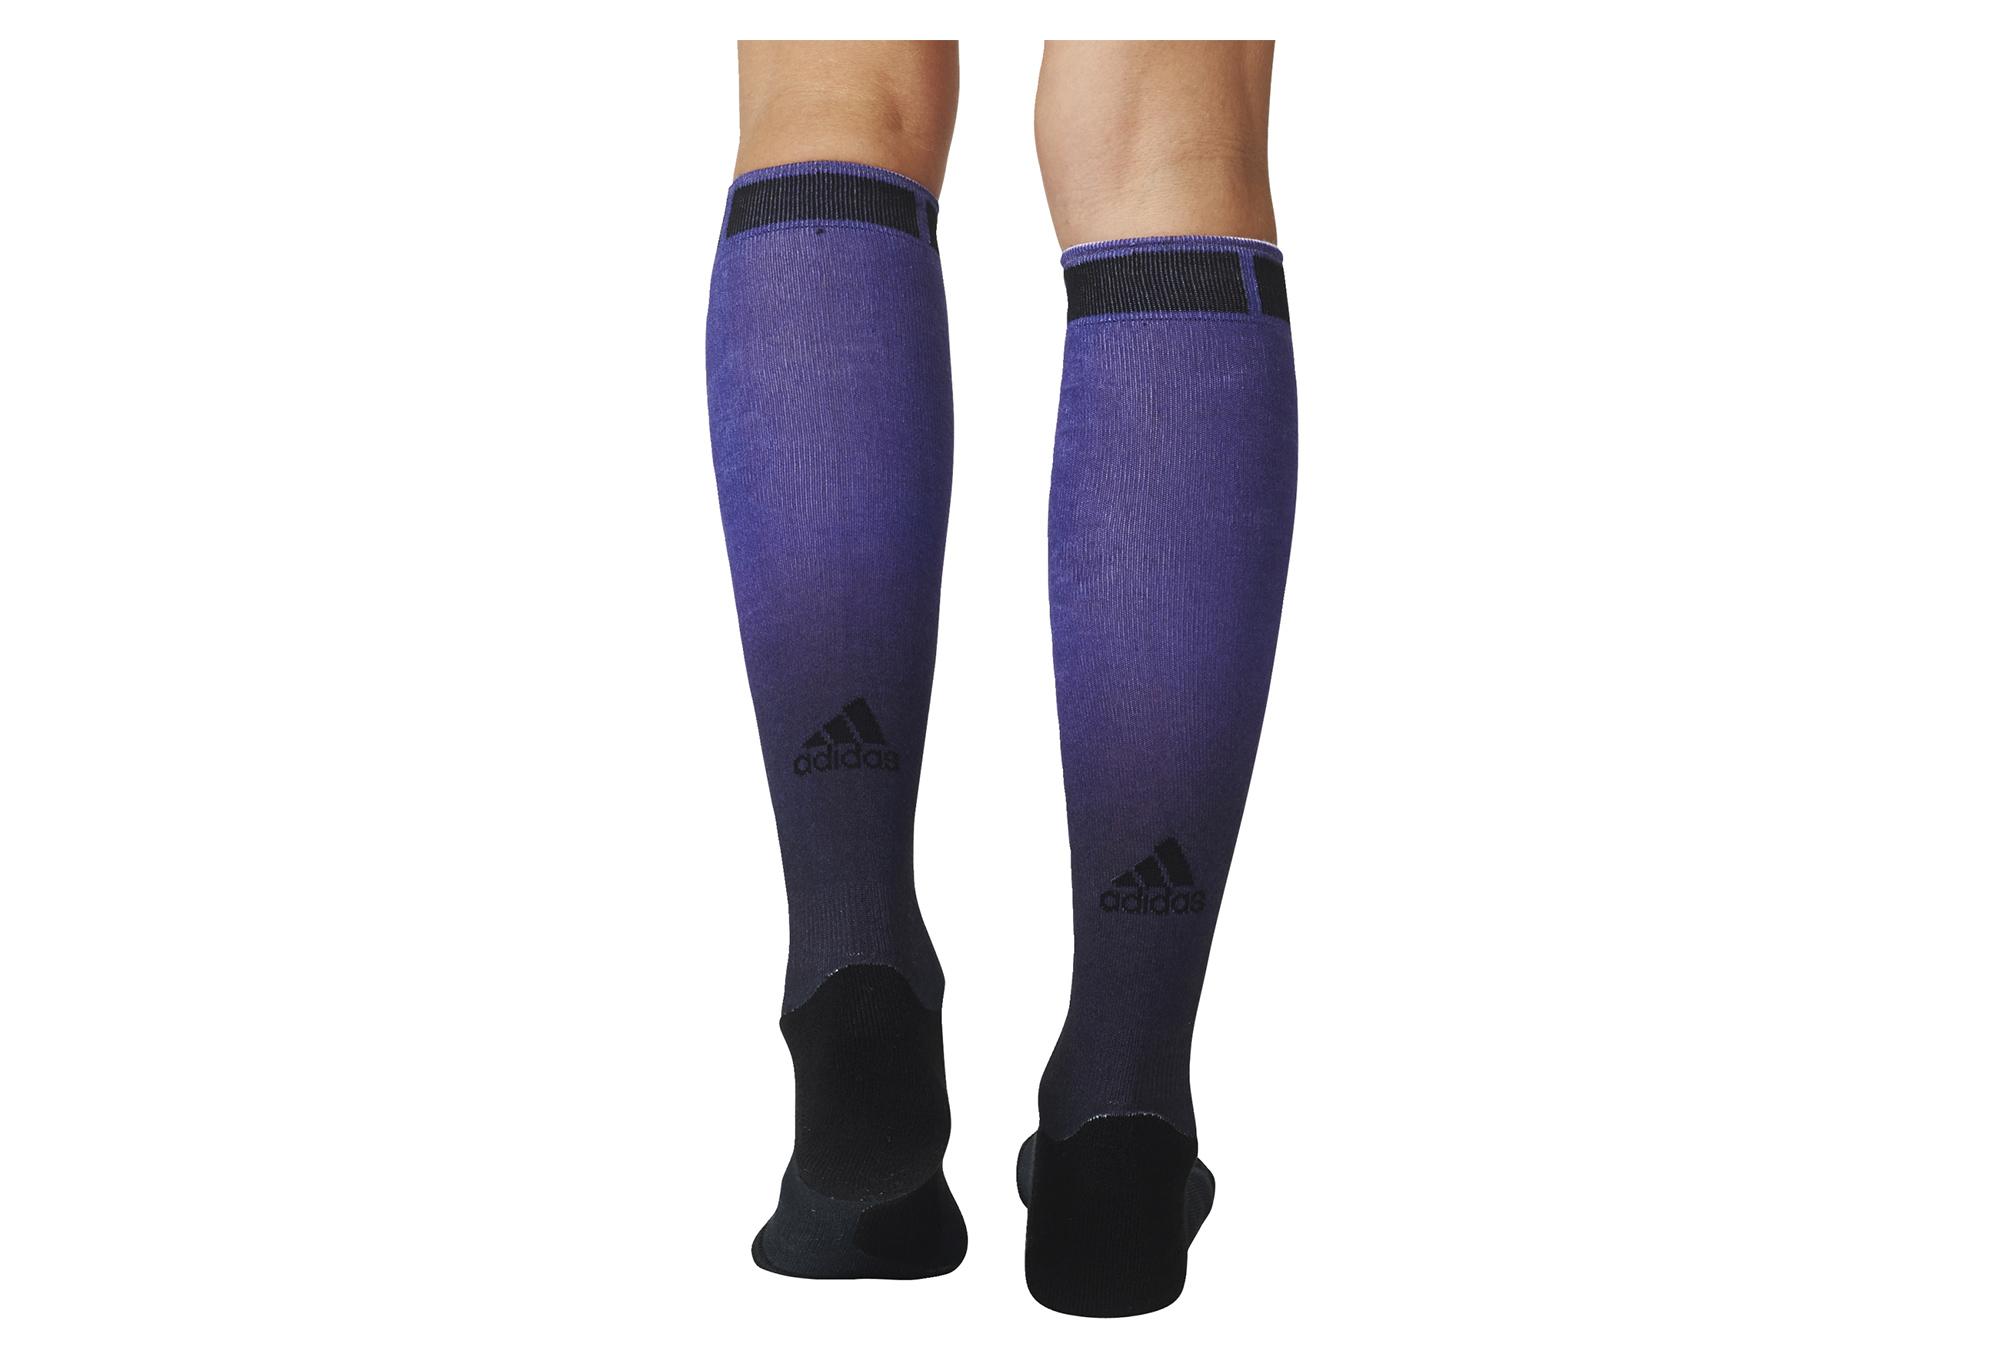 paire de chaussettes hautes femme adidas running energy. Black Bedroom Furniture Sets. Home Design Ideas